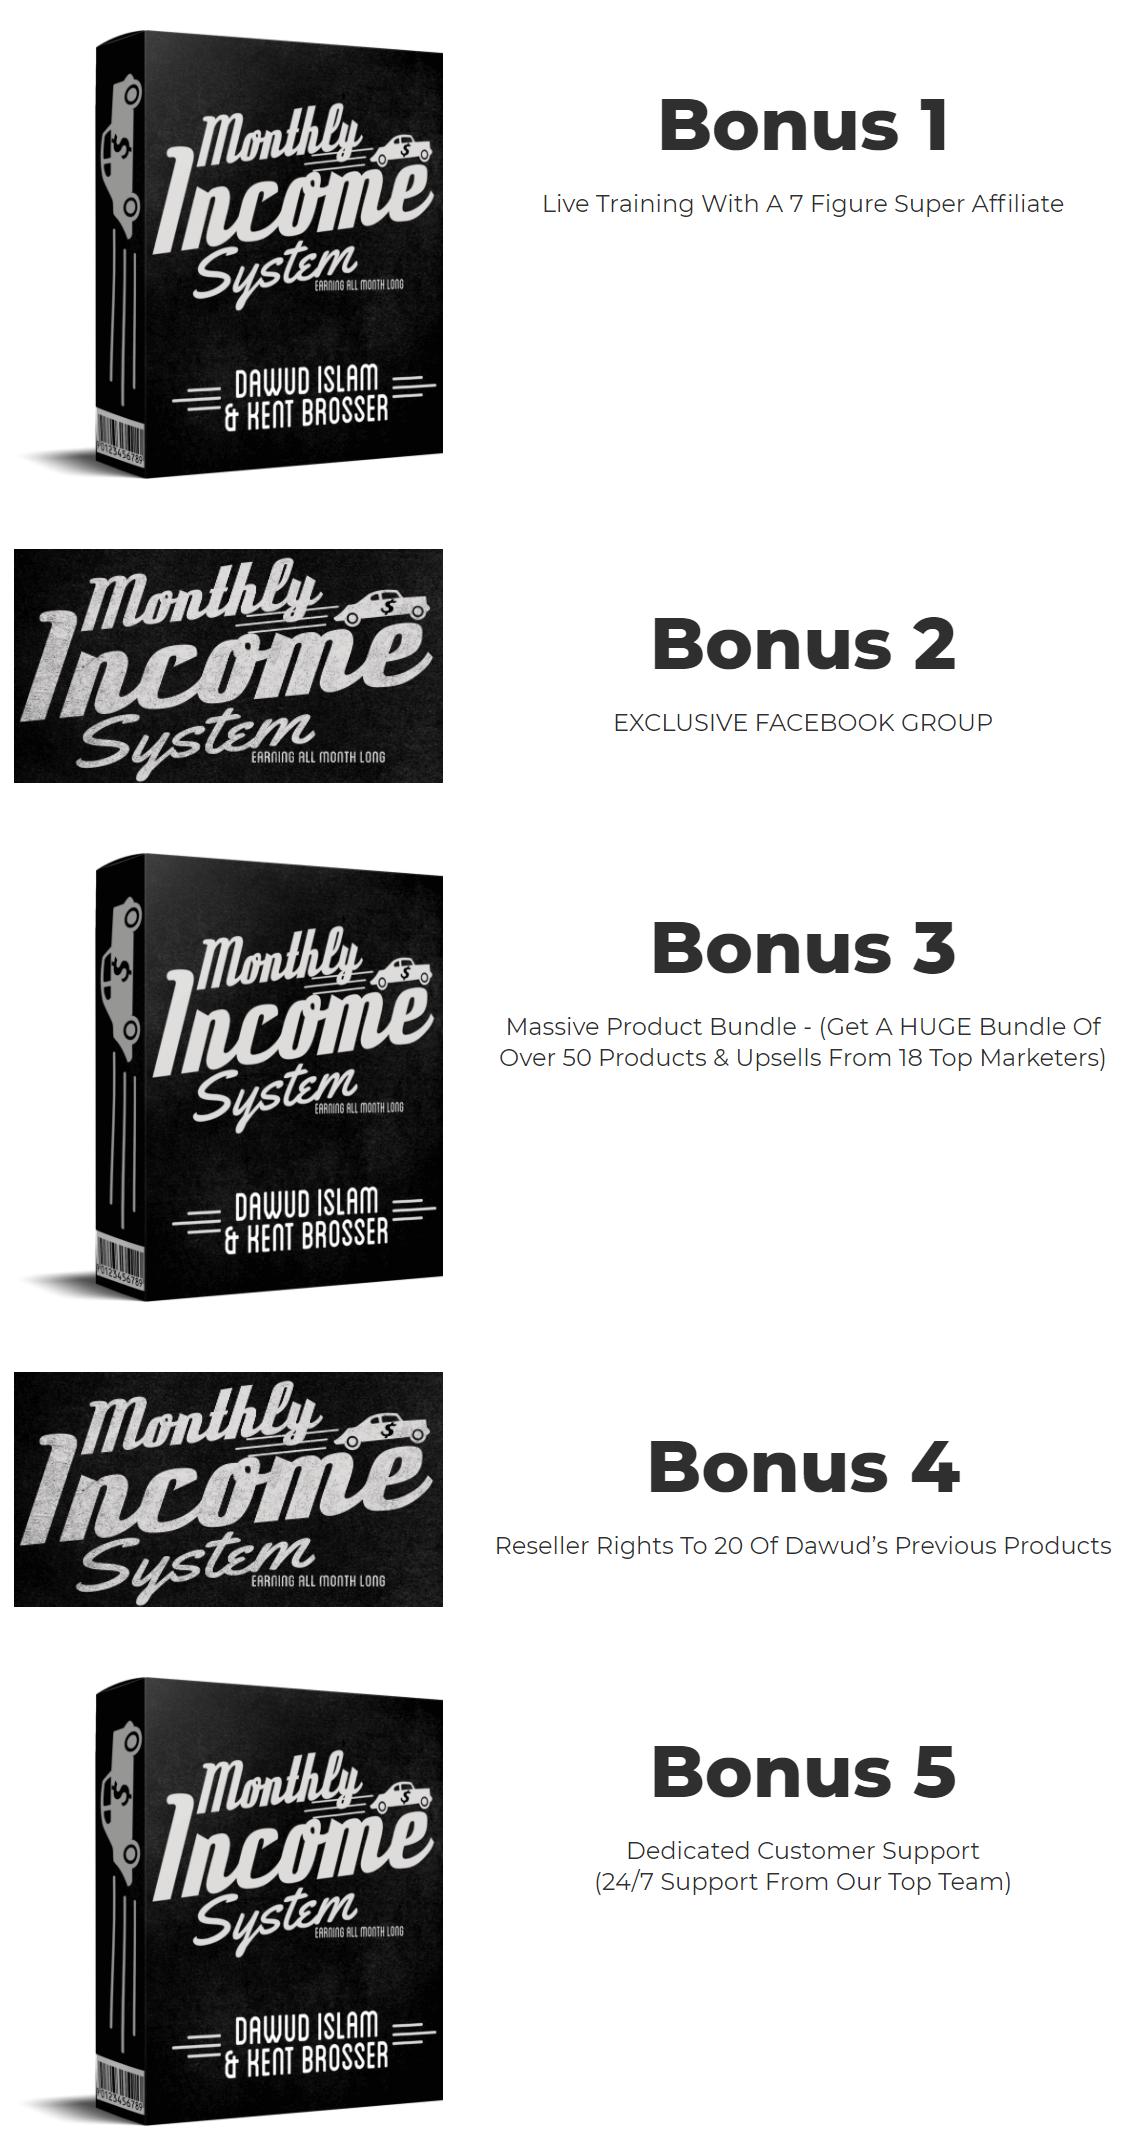 Monthly-Income-System-bonus